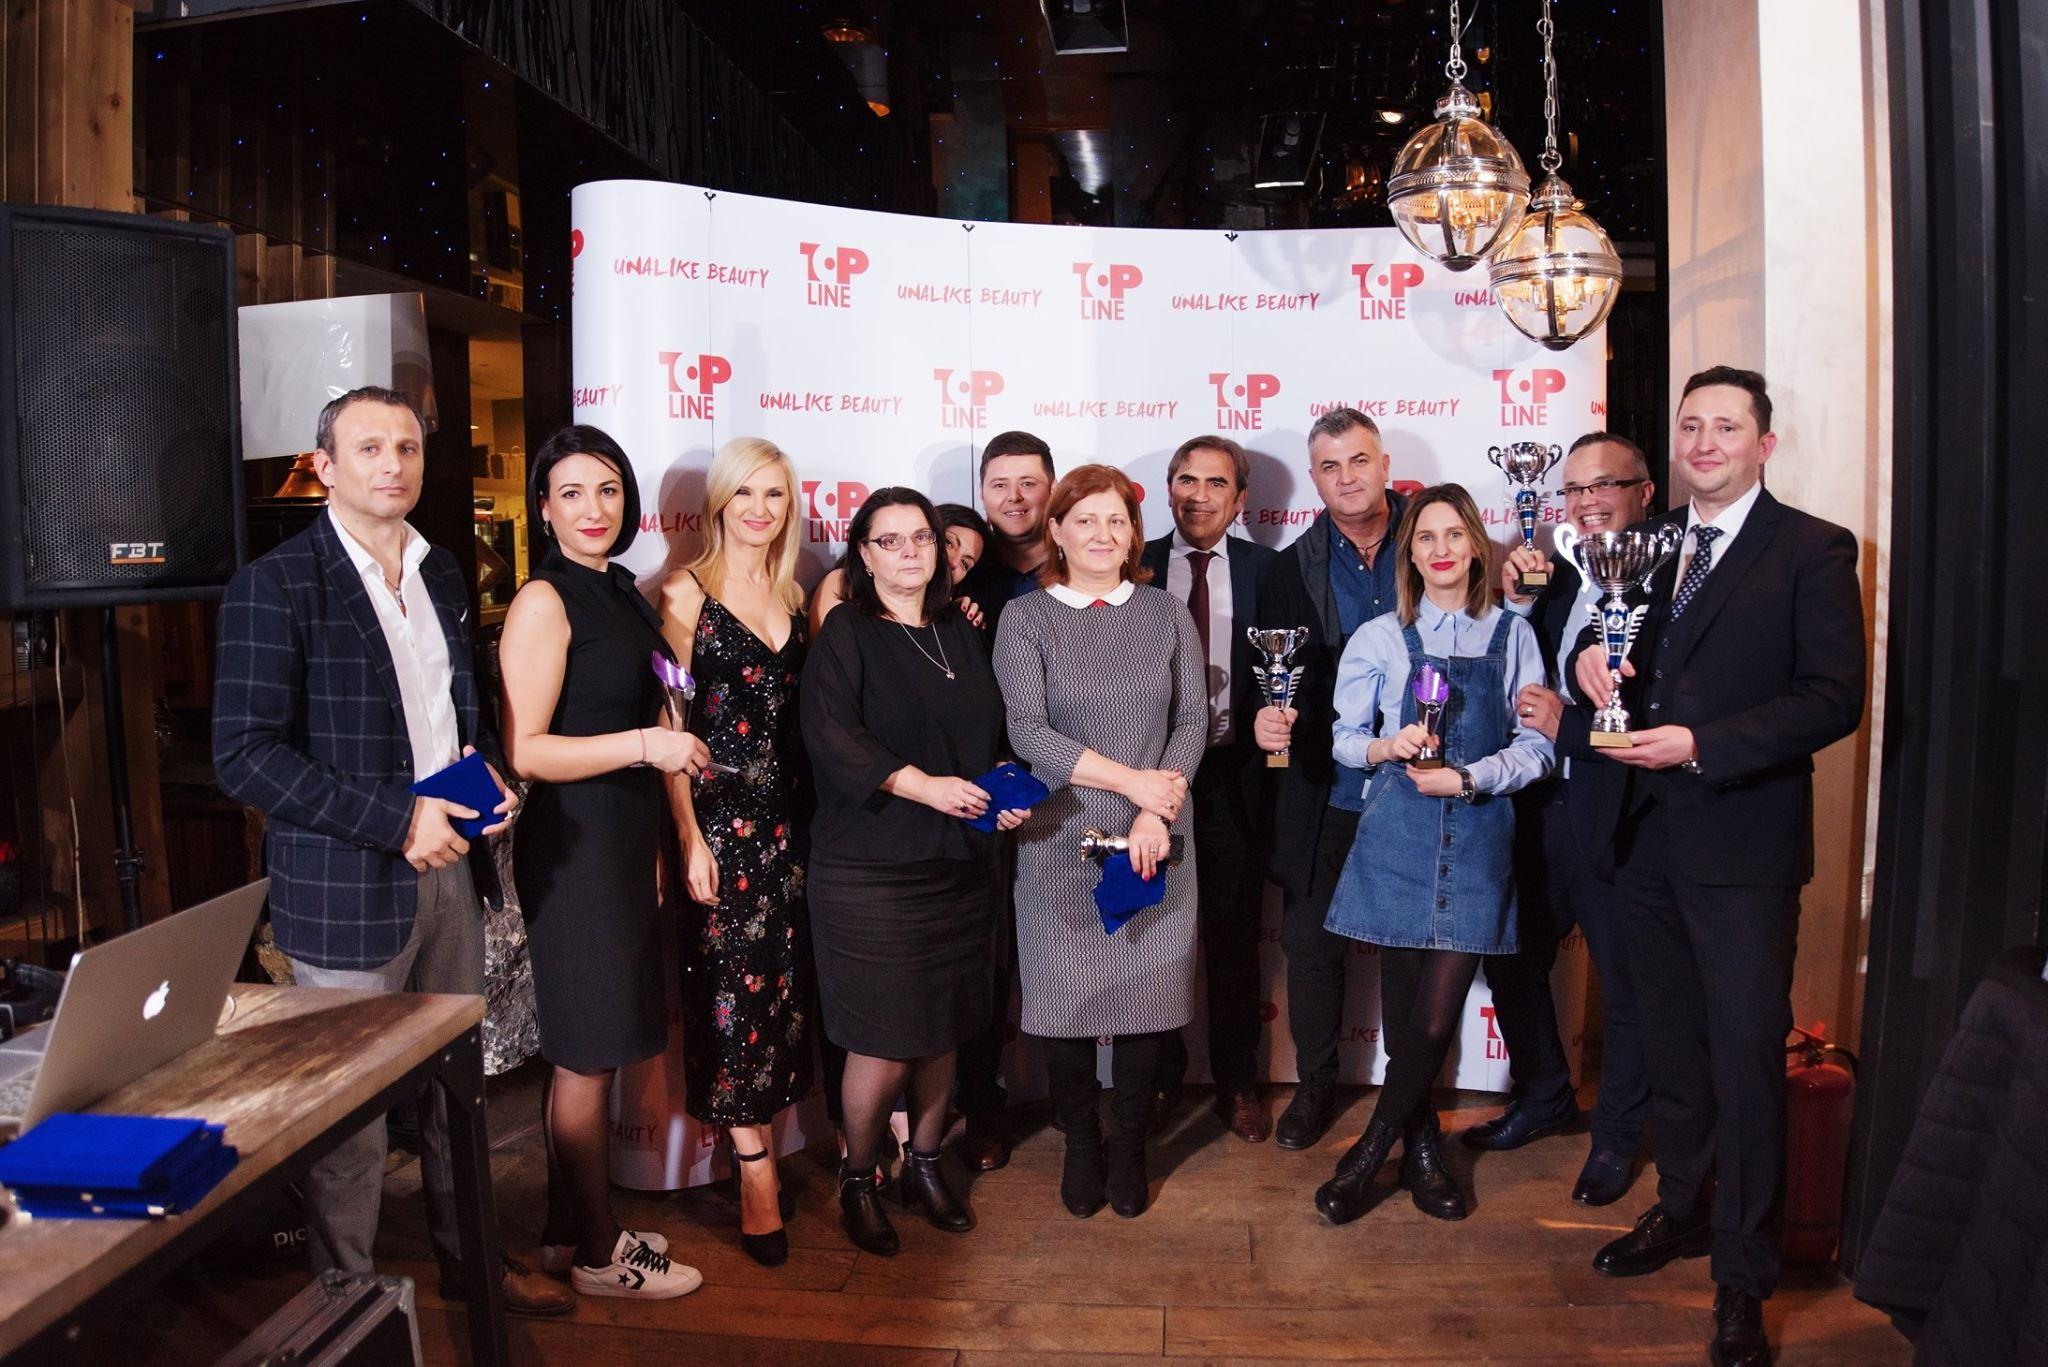 Top Line Team Unalike Party 2018 - The Winners